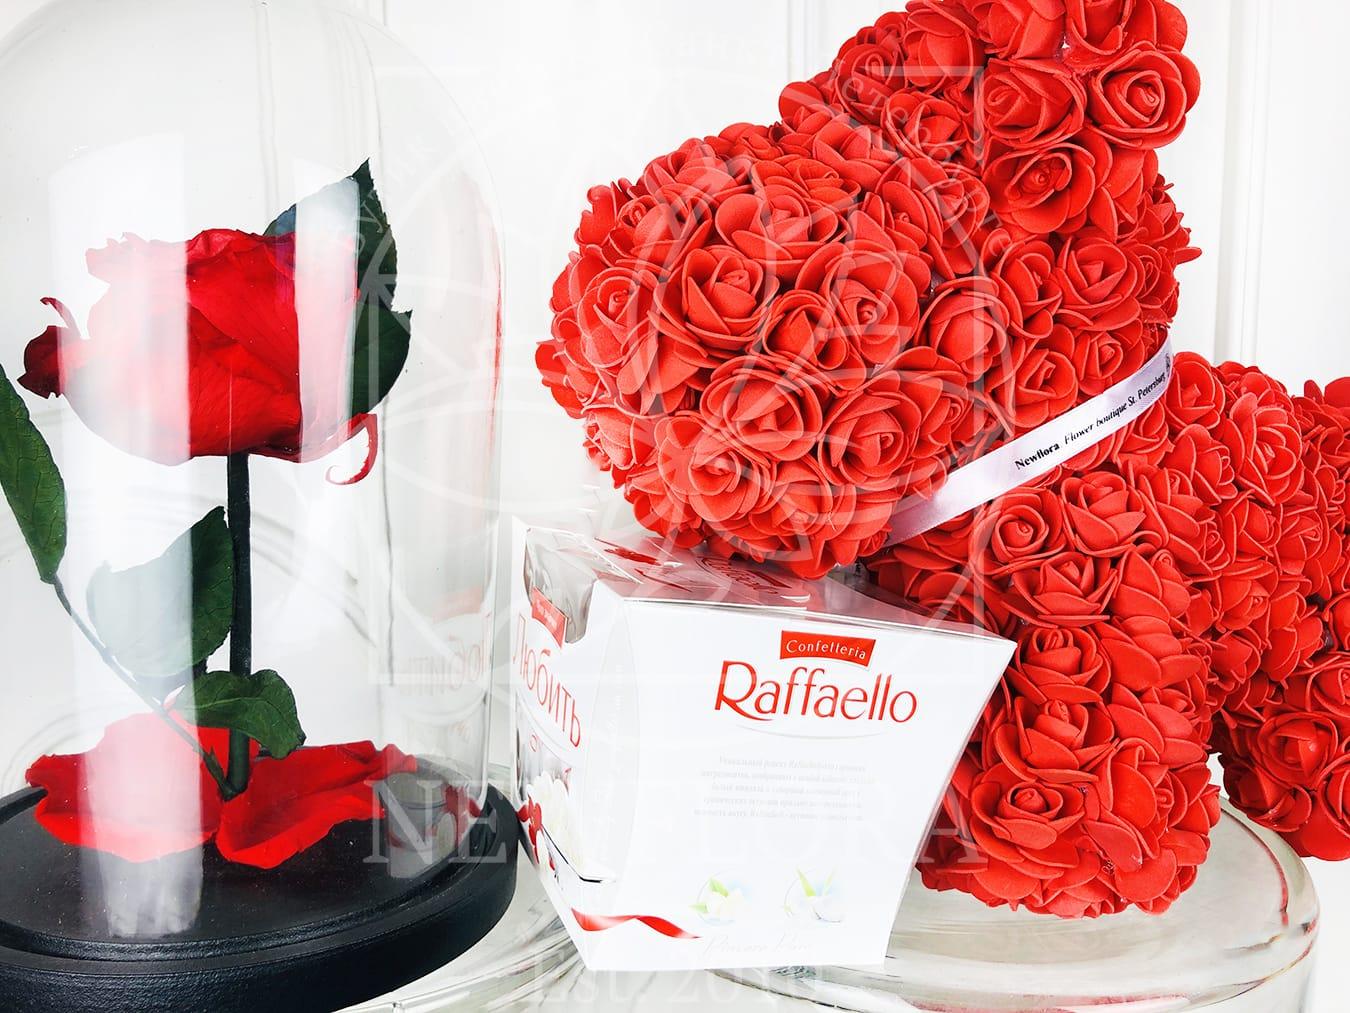 Набор raffaello + собачка из фоамирана + роза в колбе (цвет на выбор)